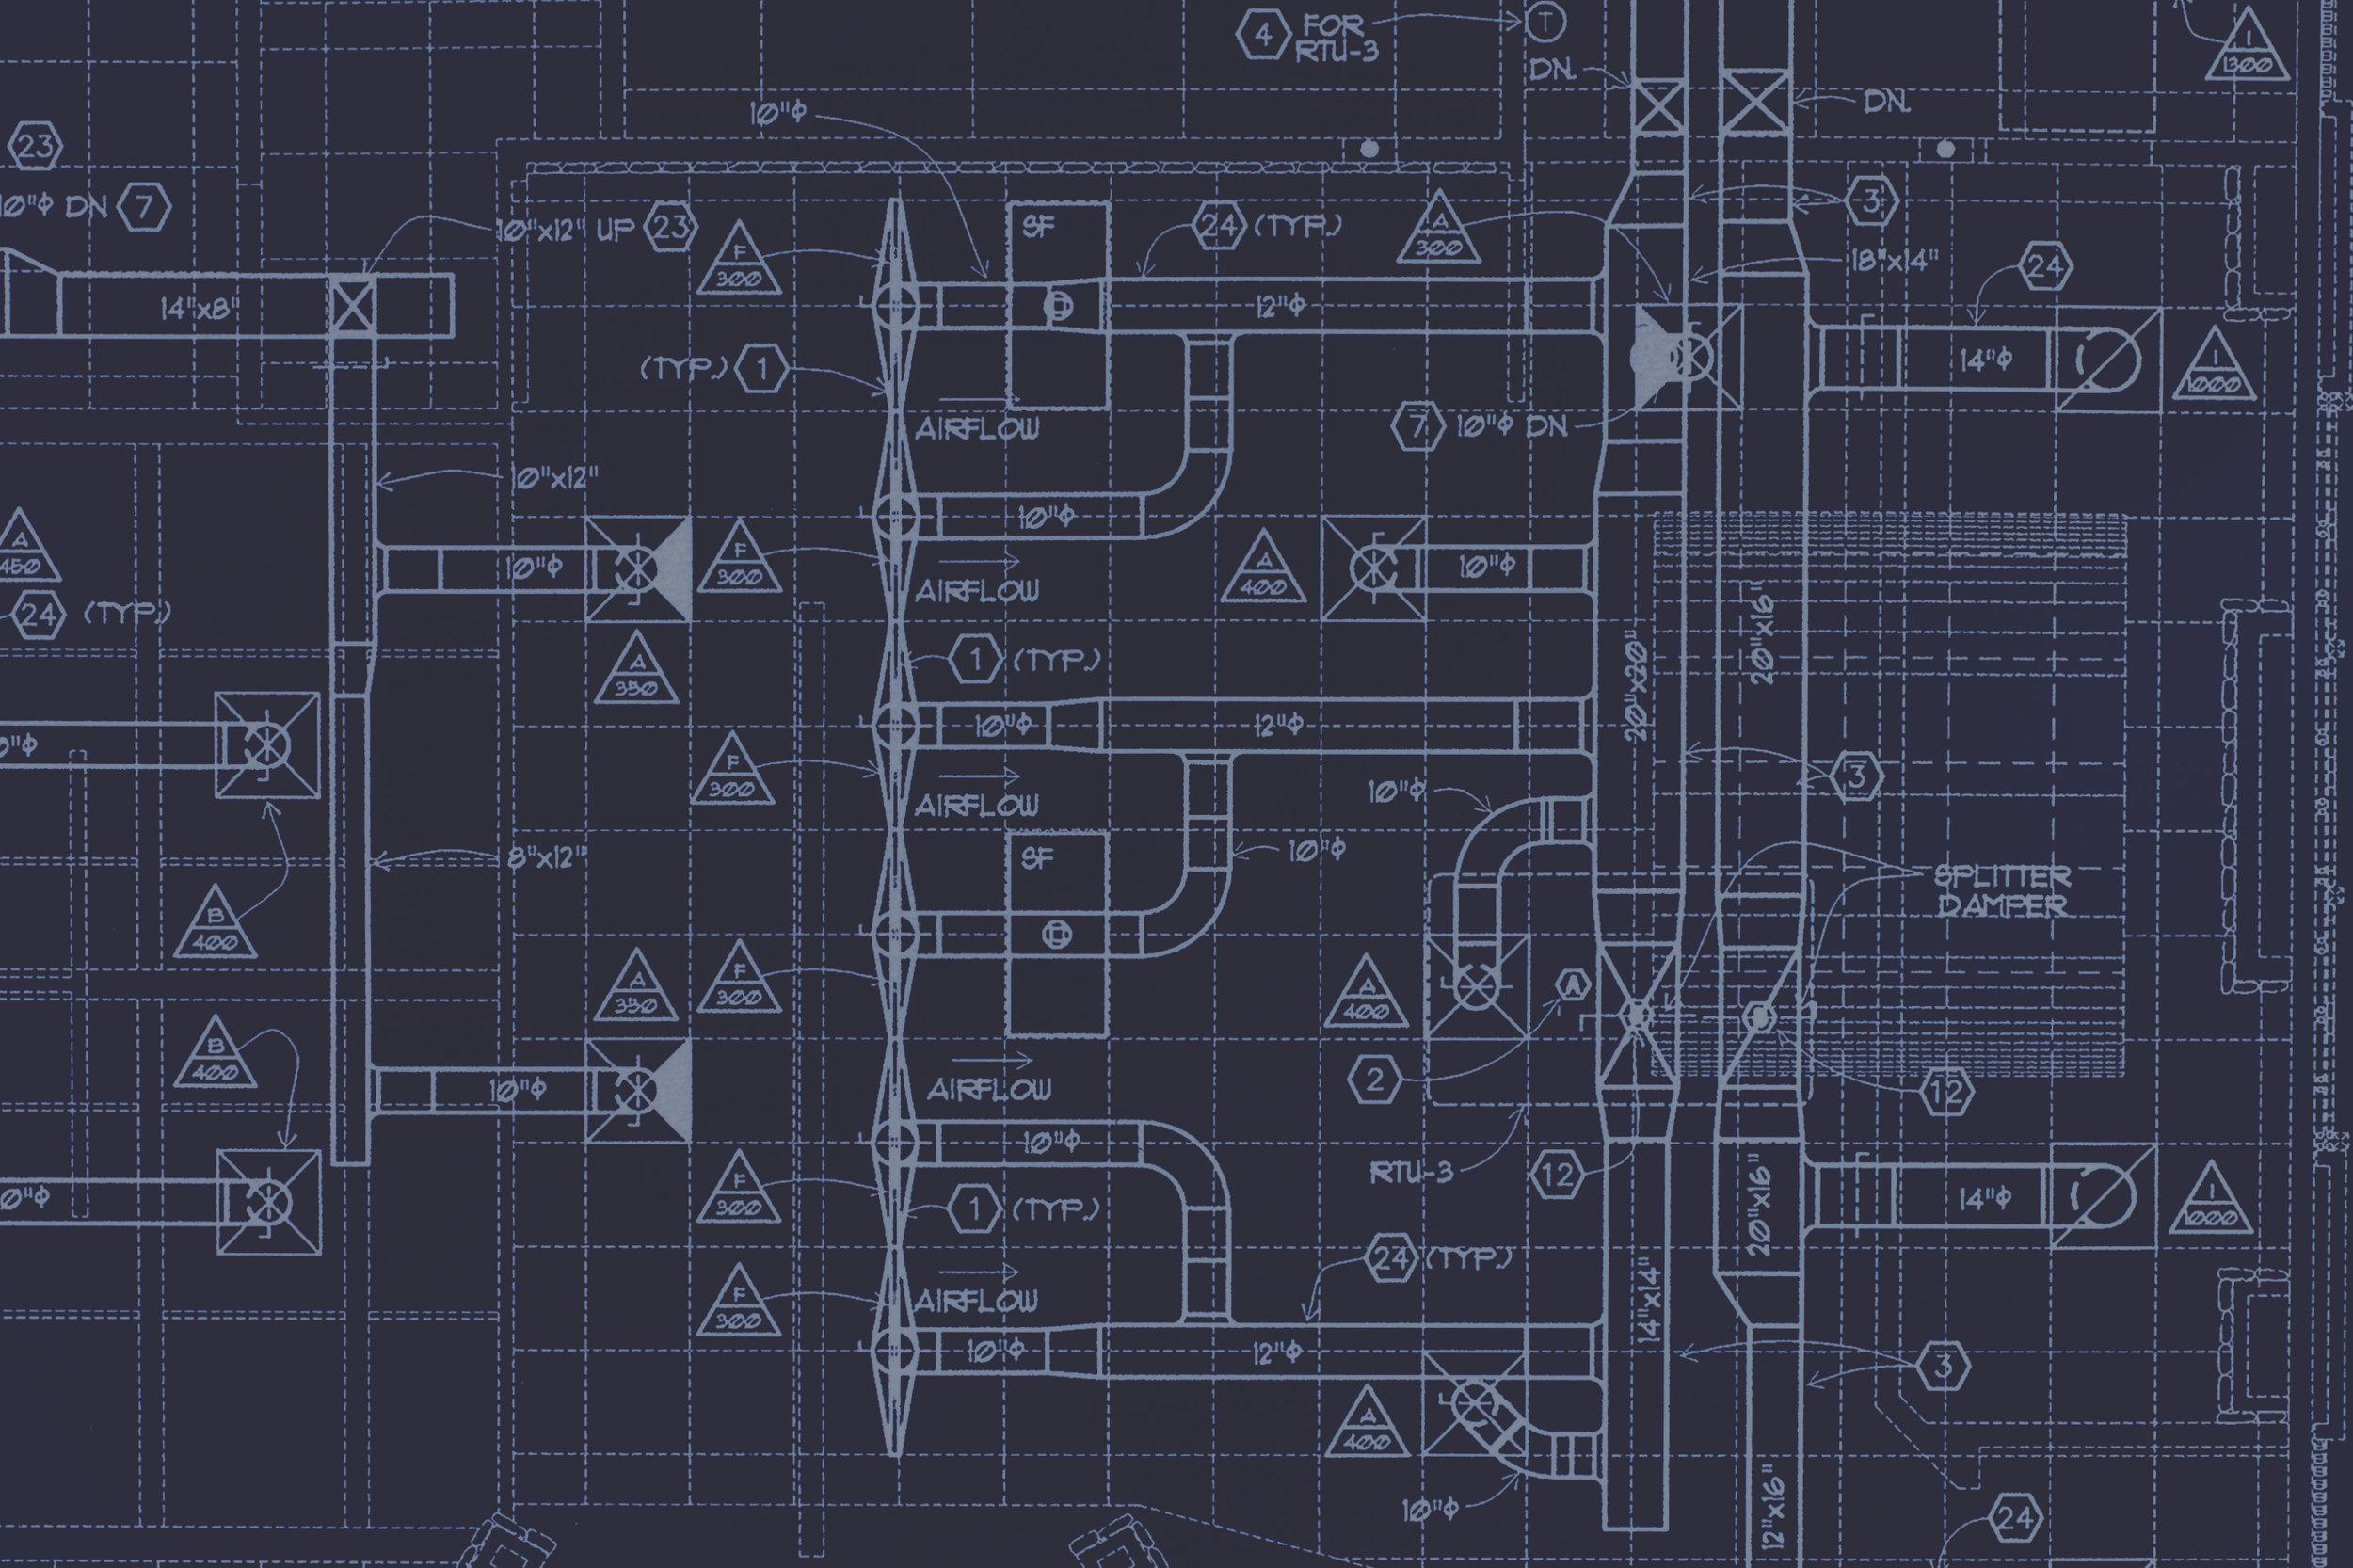 hvac system diagram jpg [ 1500 x 1000 Pixel ]